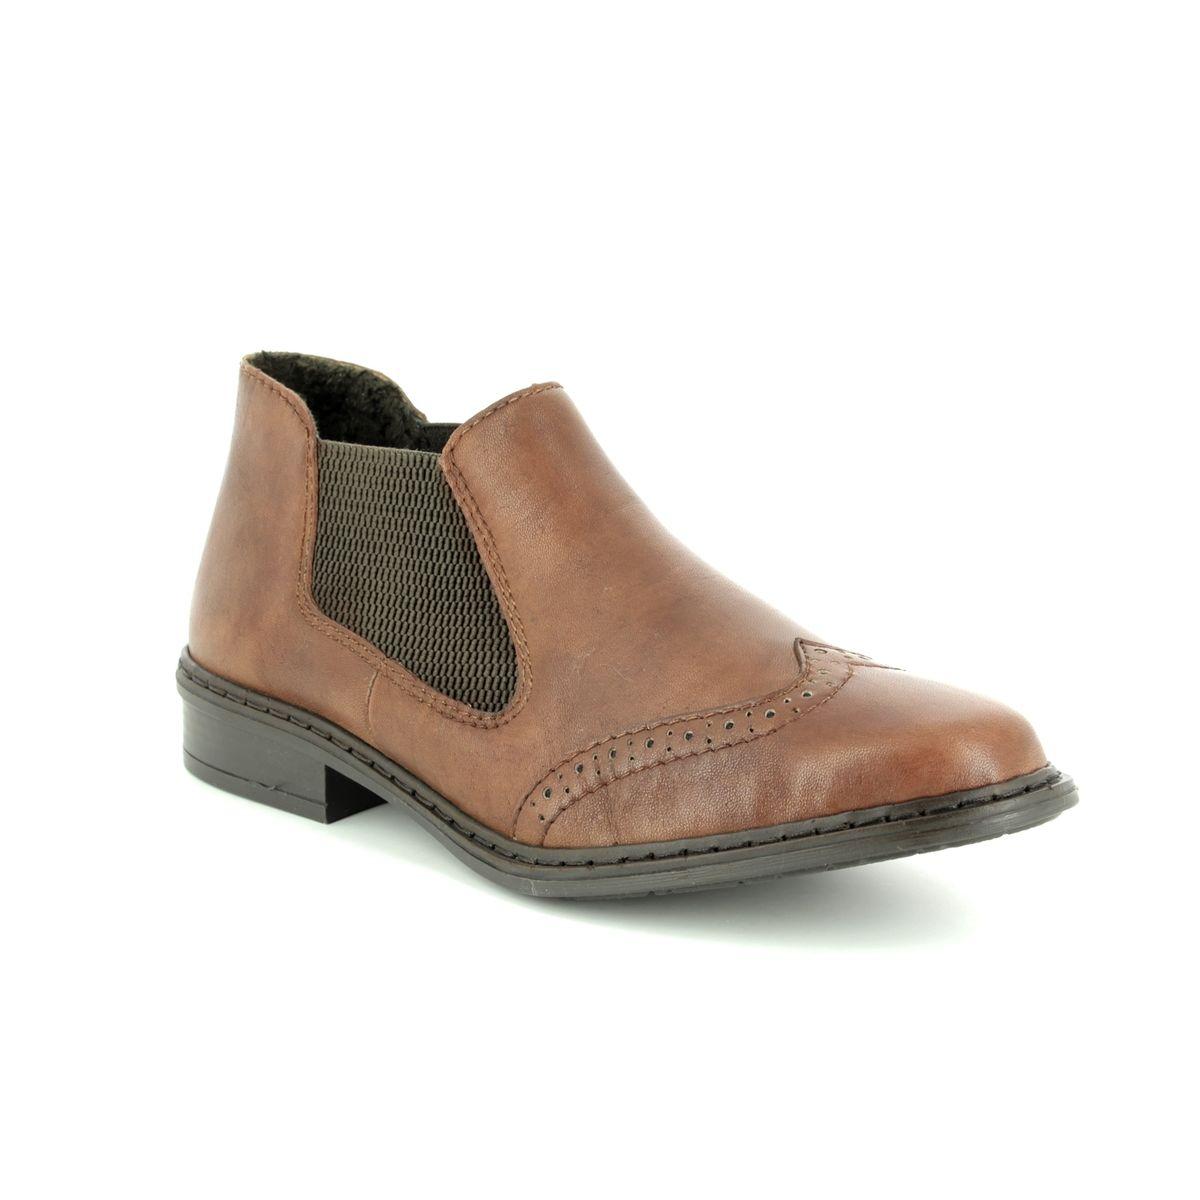 c7ad1a3b48d9cd Rieker Chelsea Boots - Brown - 52093-22 WEAVER